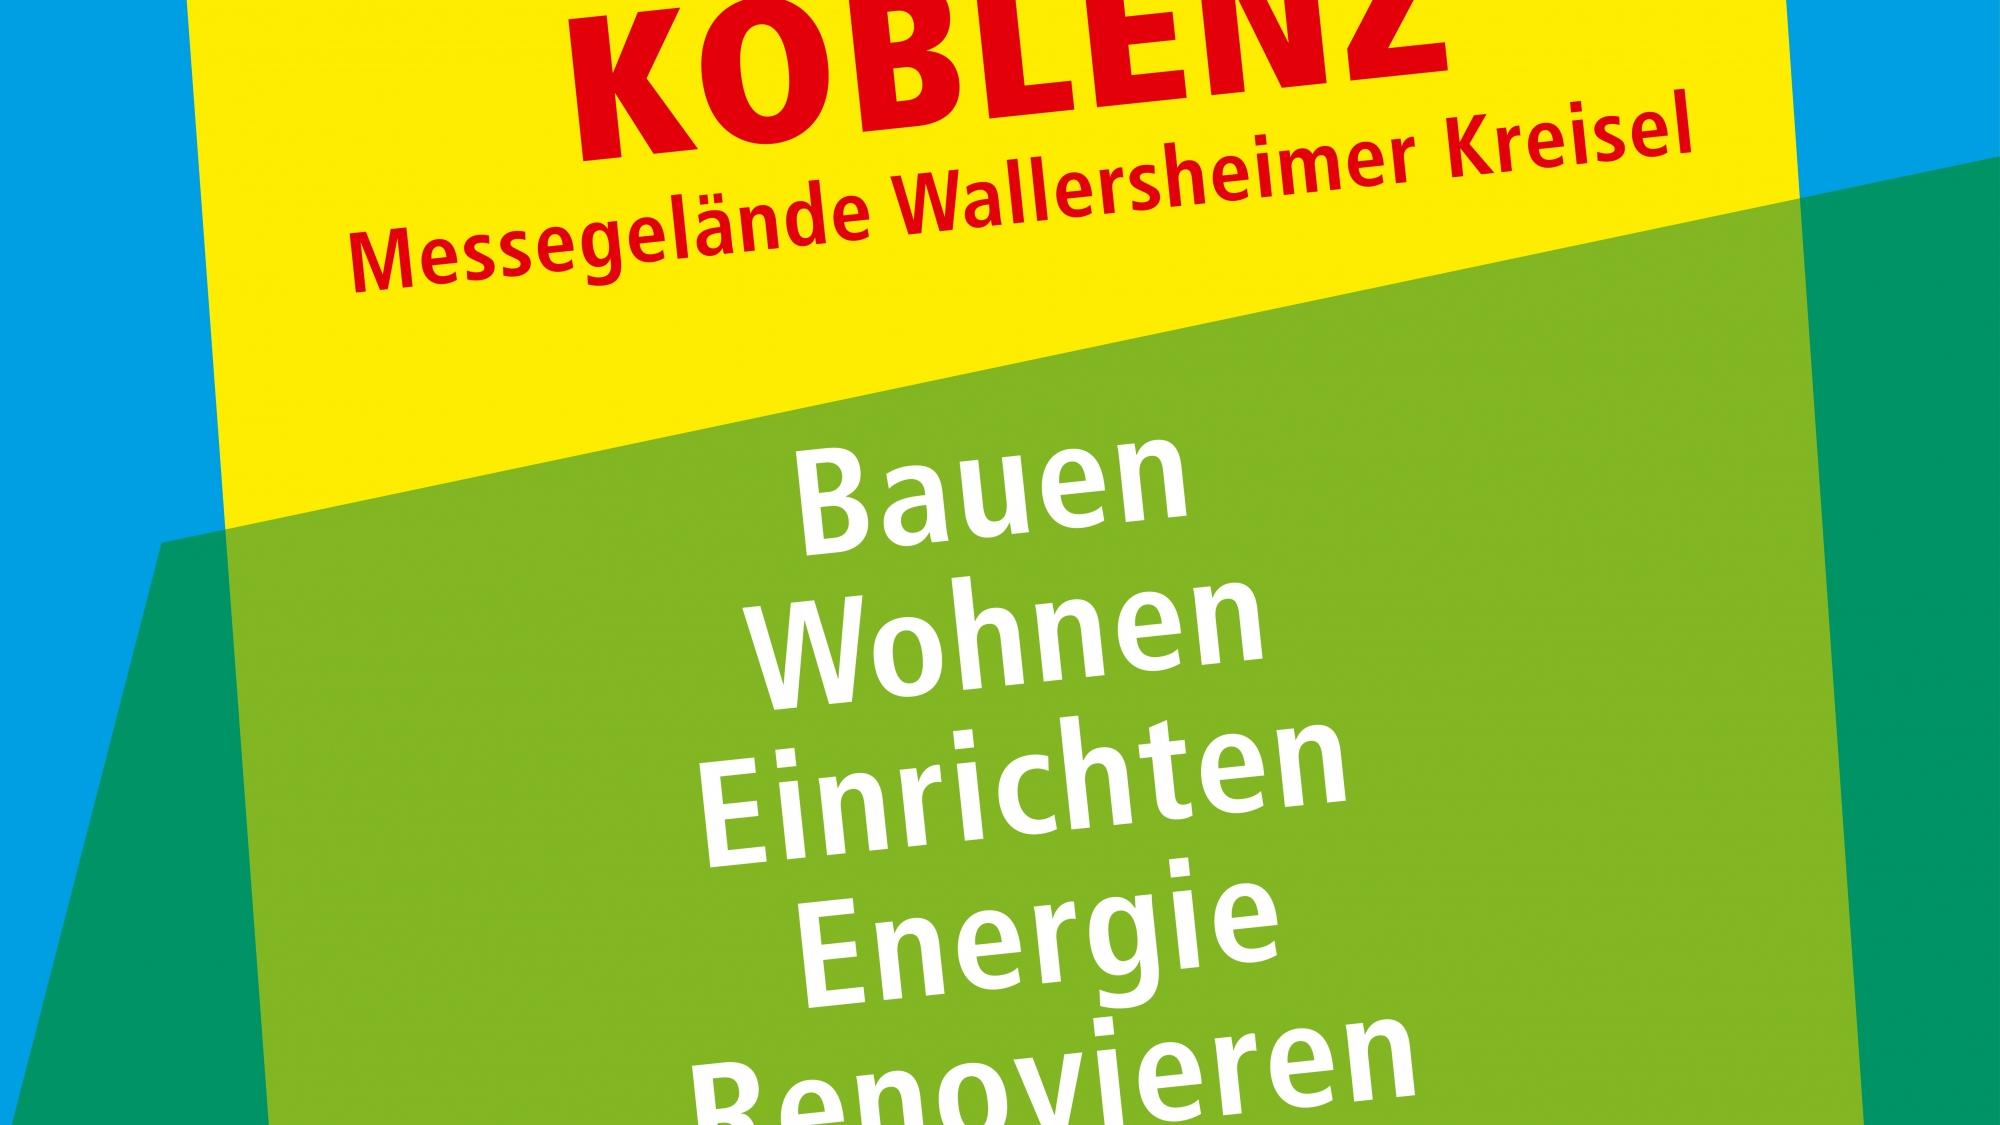 MoCo-Koenitz-Plakat-RheinlandBAU-DINA1-RZ_DRUCK-001